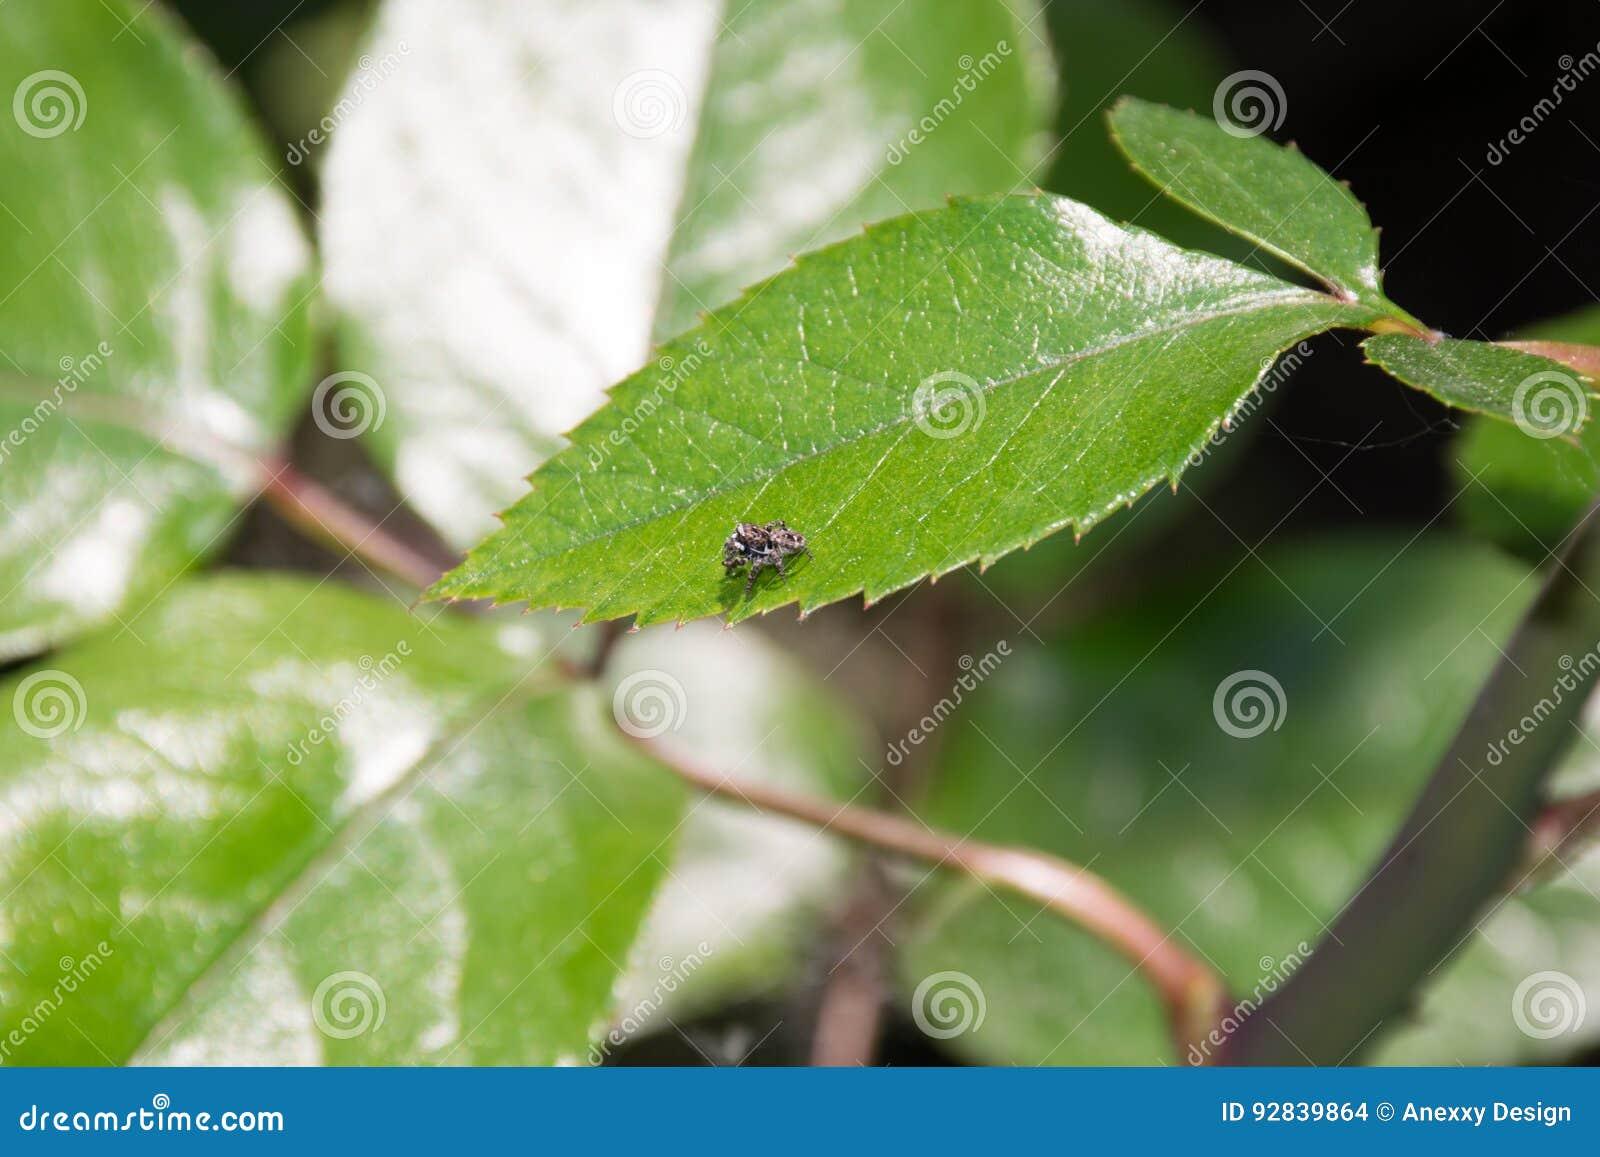 Araña en la hoja